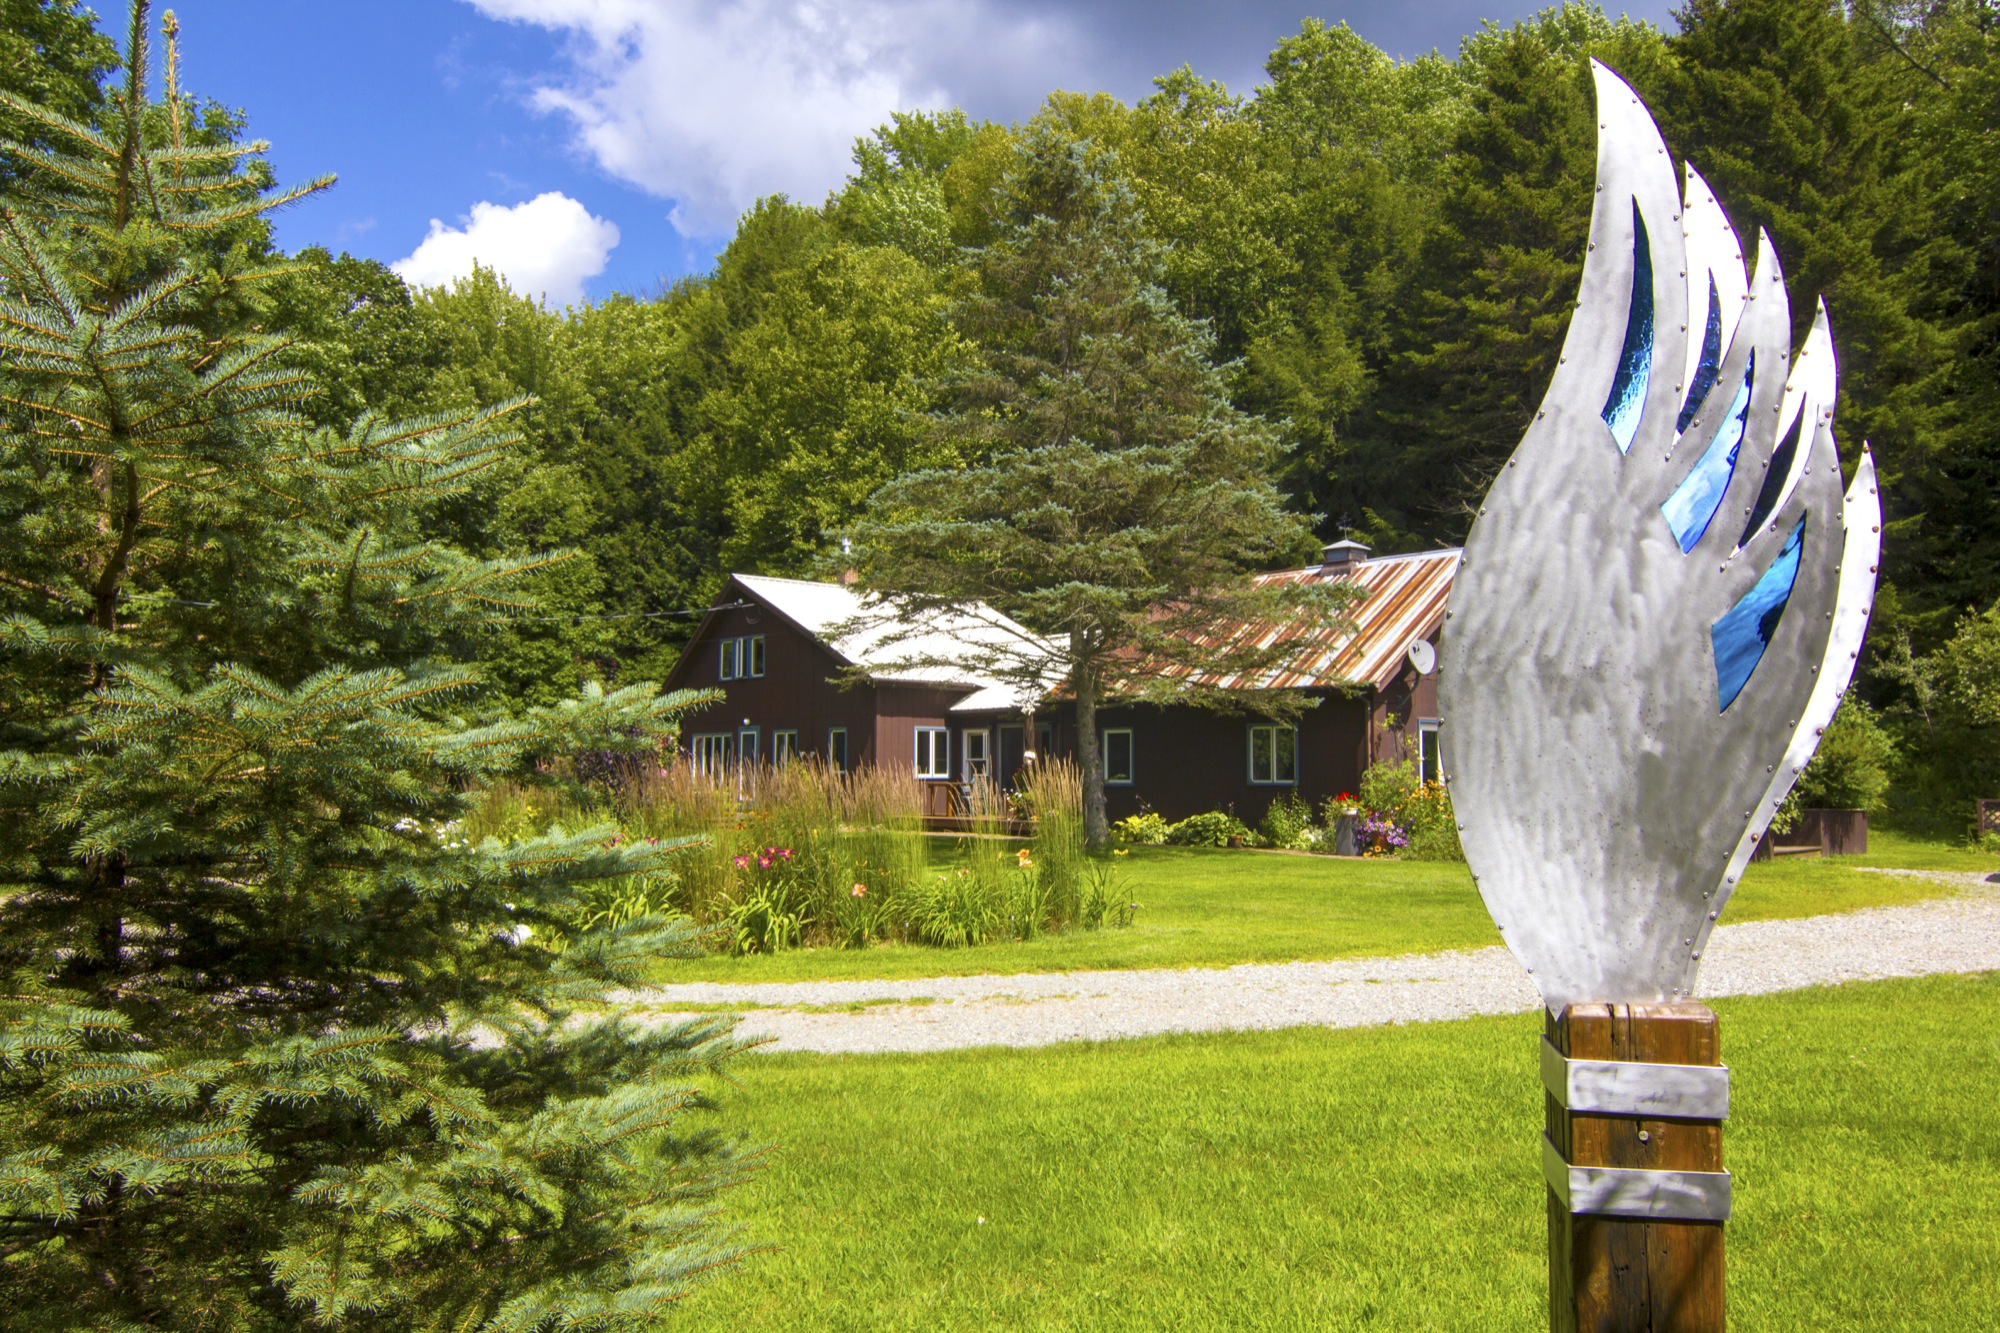 21-IMG_0537 Lipke Sculpture to House Across Drieveway.jpg